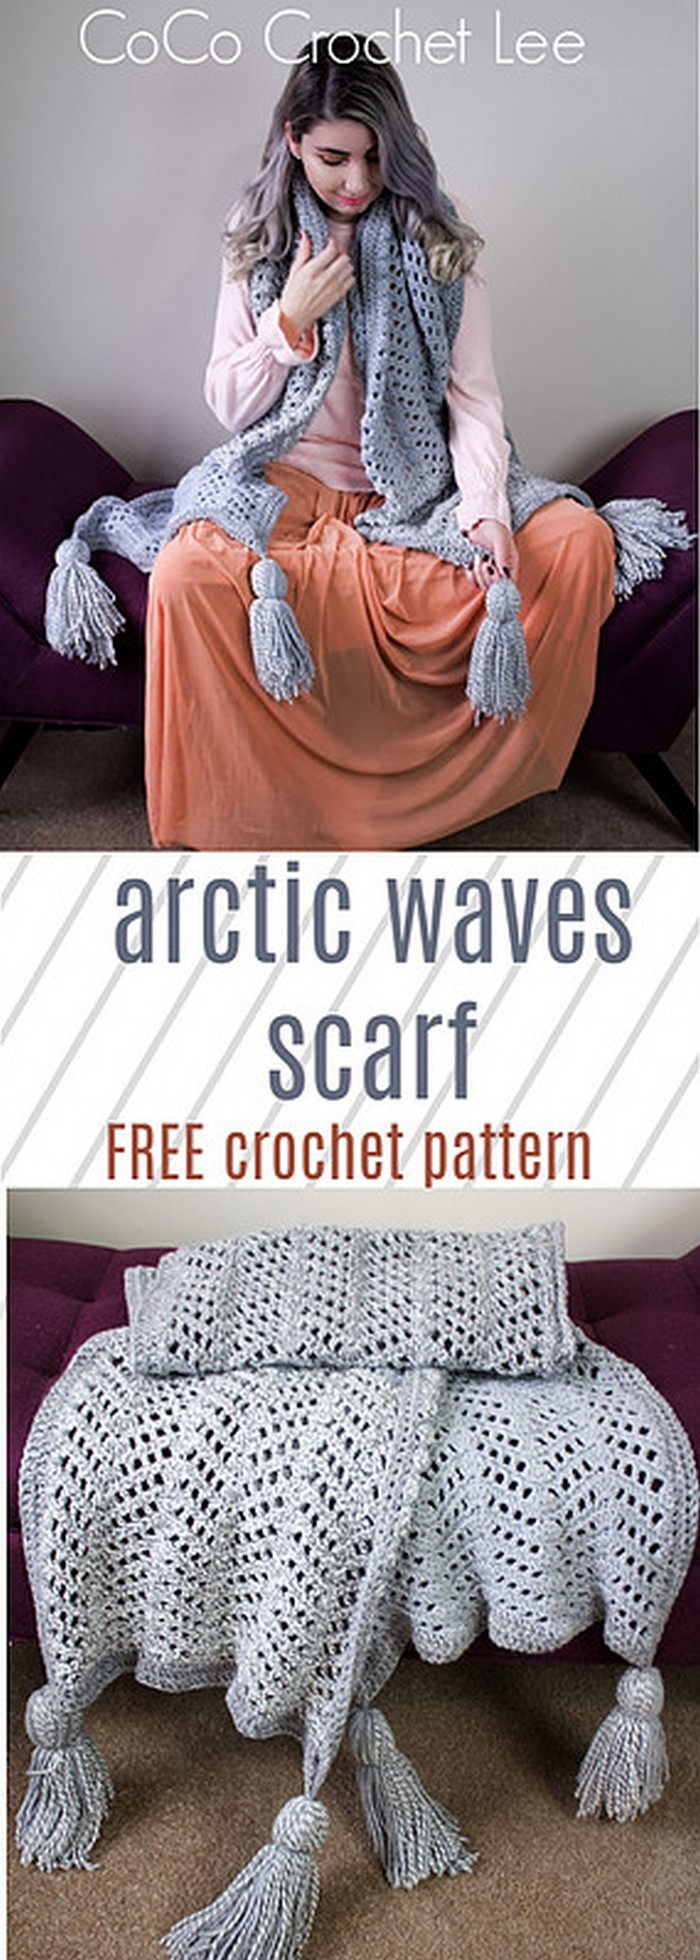 Arctic Wave Scarf Free Crochet Pattern